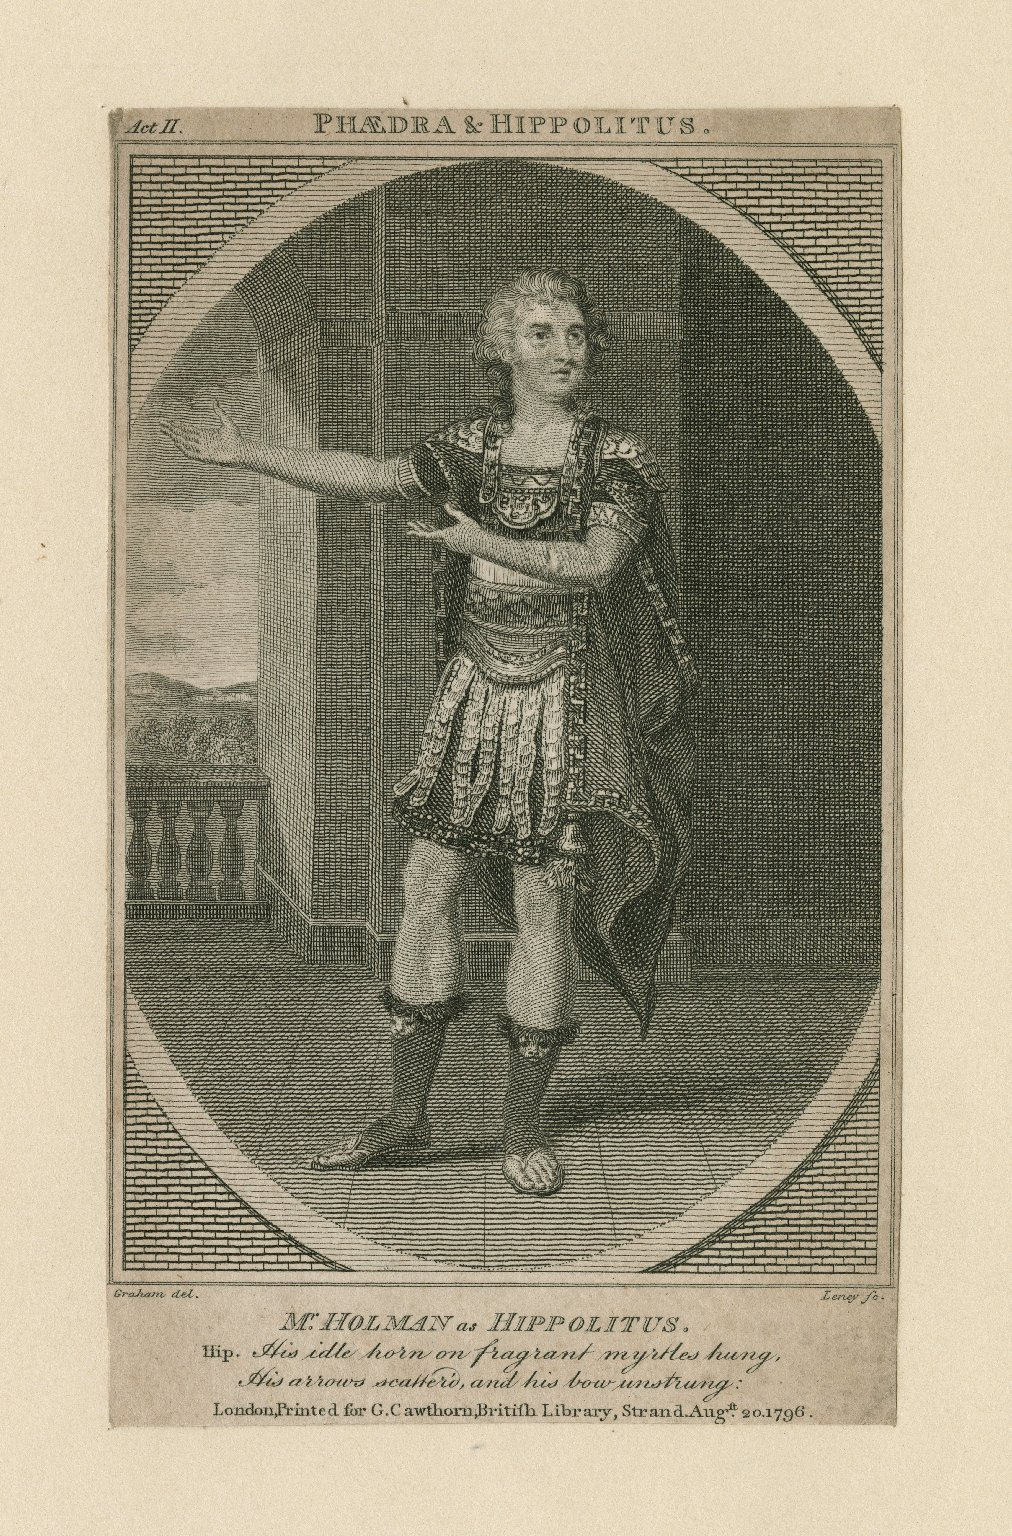 Mr. Holman as Hippolitus ... [in Smith's Phaedra and Hippolytus] [graphic] / Graham, del. ; Leney, sc.